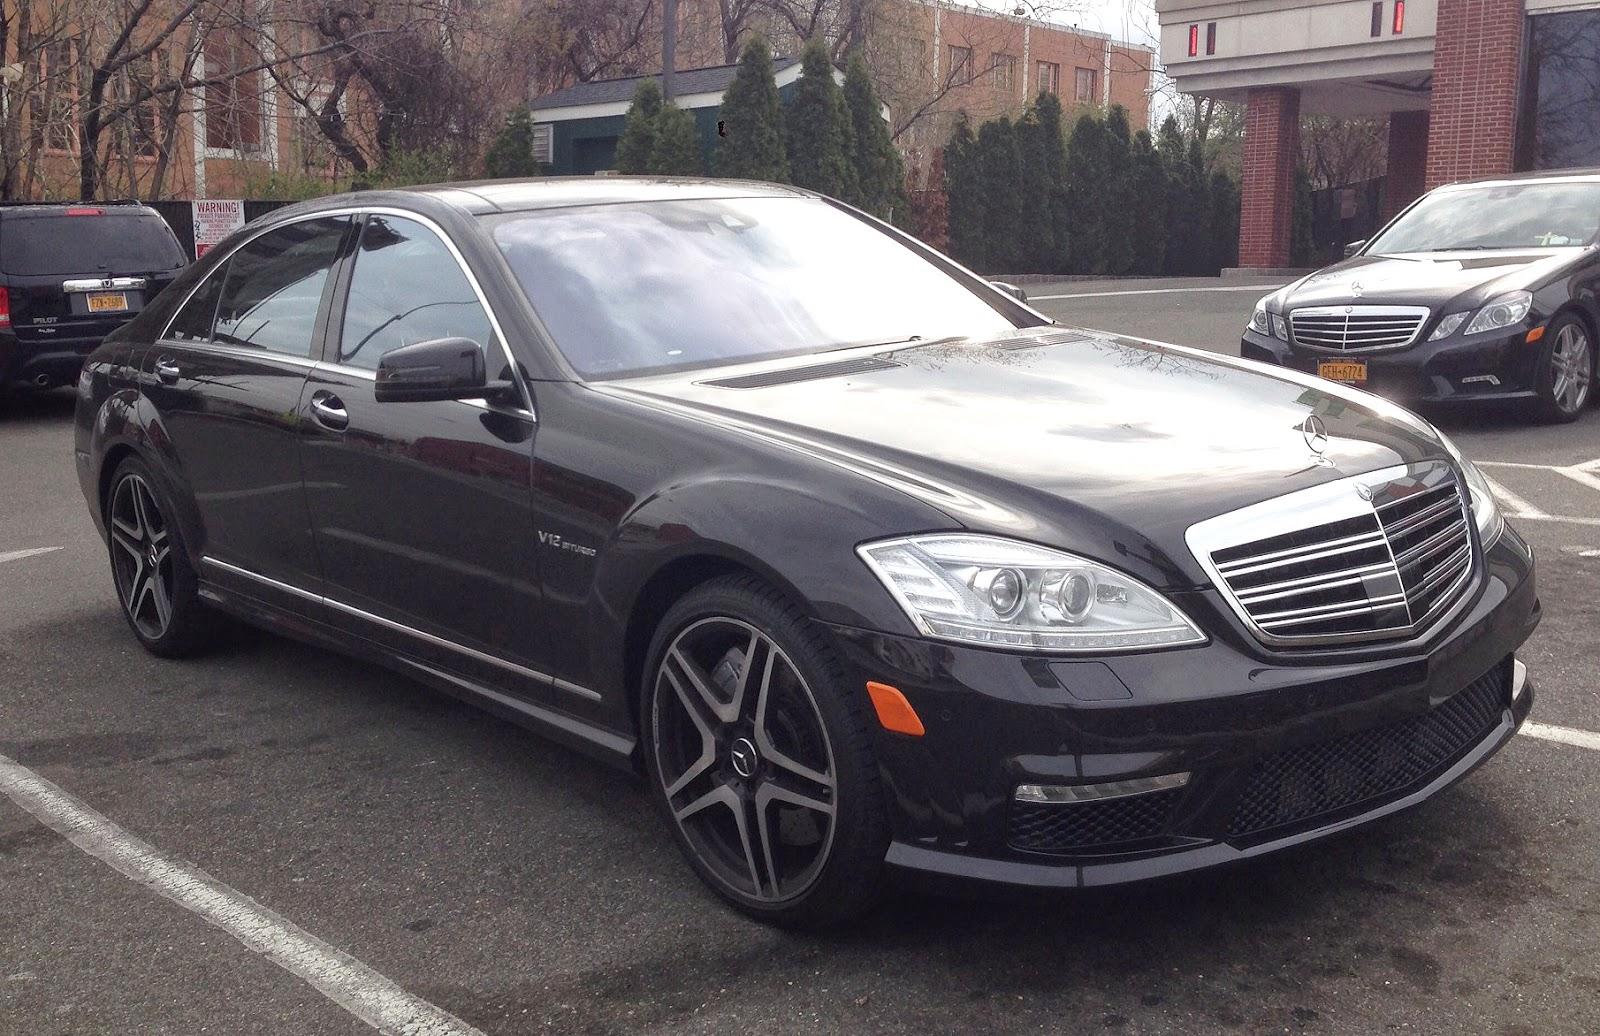 Cho thuê xe Mercedes S65 AMG siêu VIP